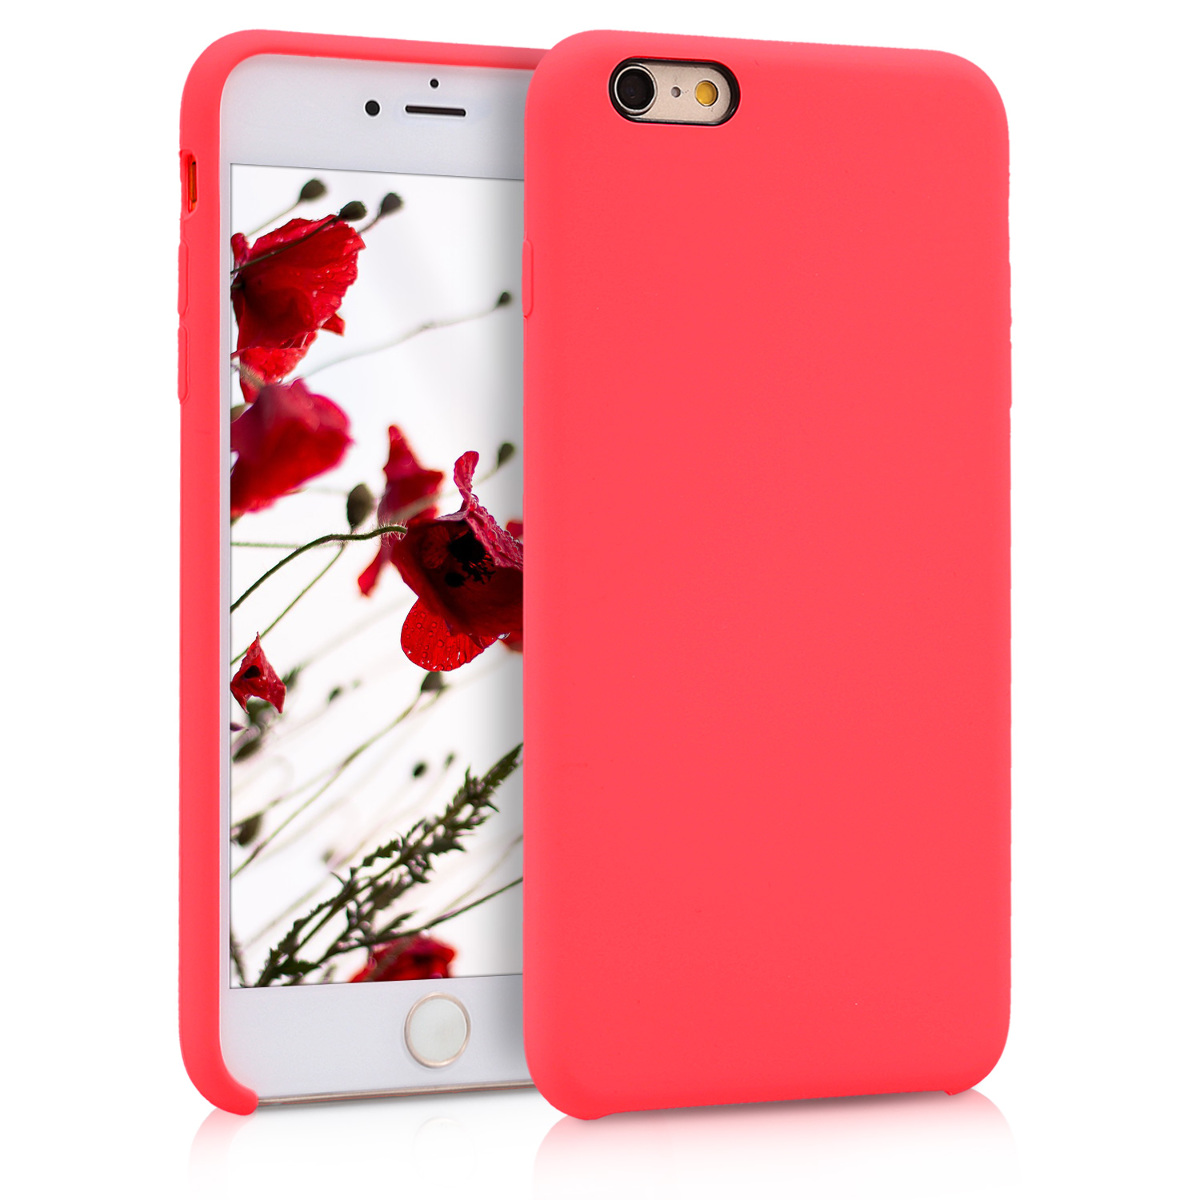 Kvalitní silikonové TPU pouzdro pro Apple iPhone 6 Plus / 6S - Neon Red